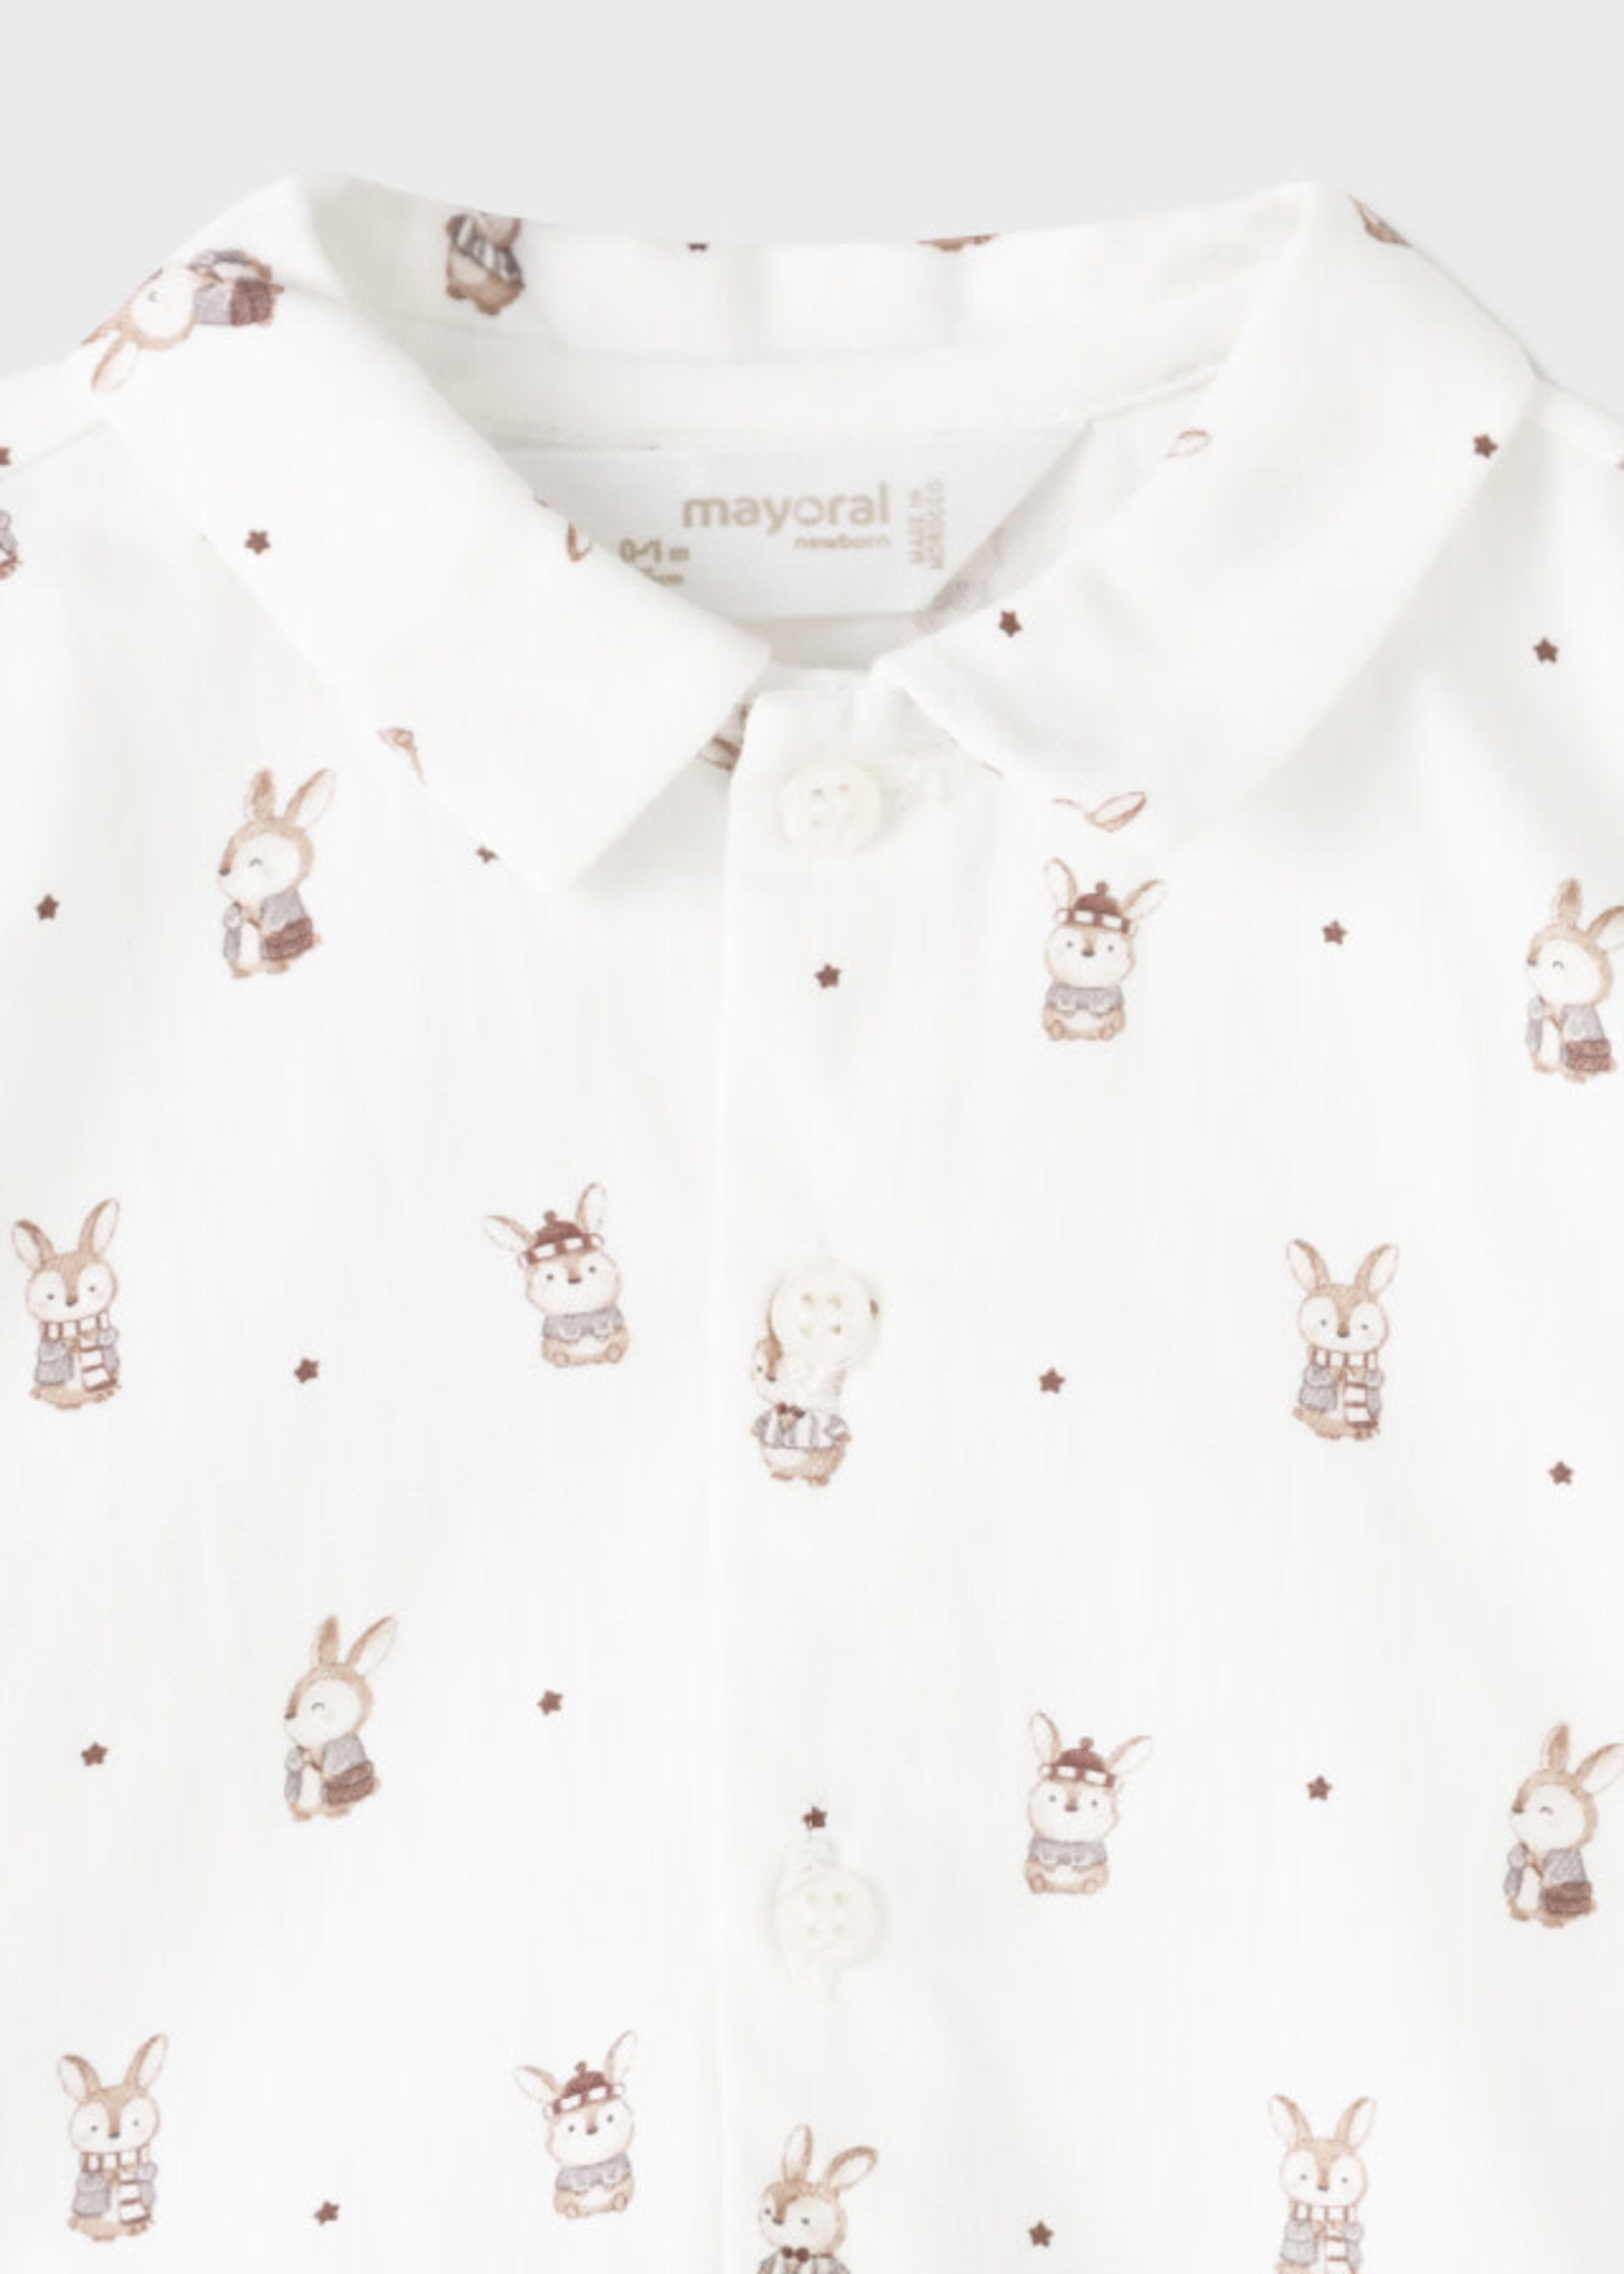 "MAYORAL MAYORAL Hemdje+Shortje+Kousjes ""Bunnies"""